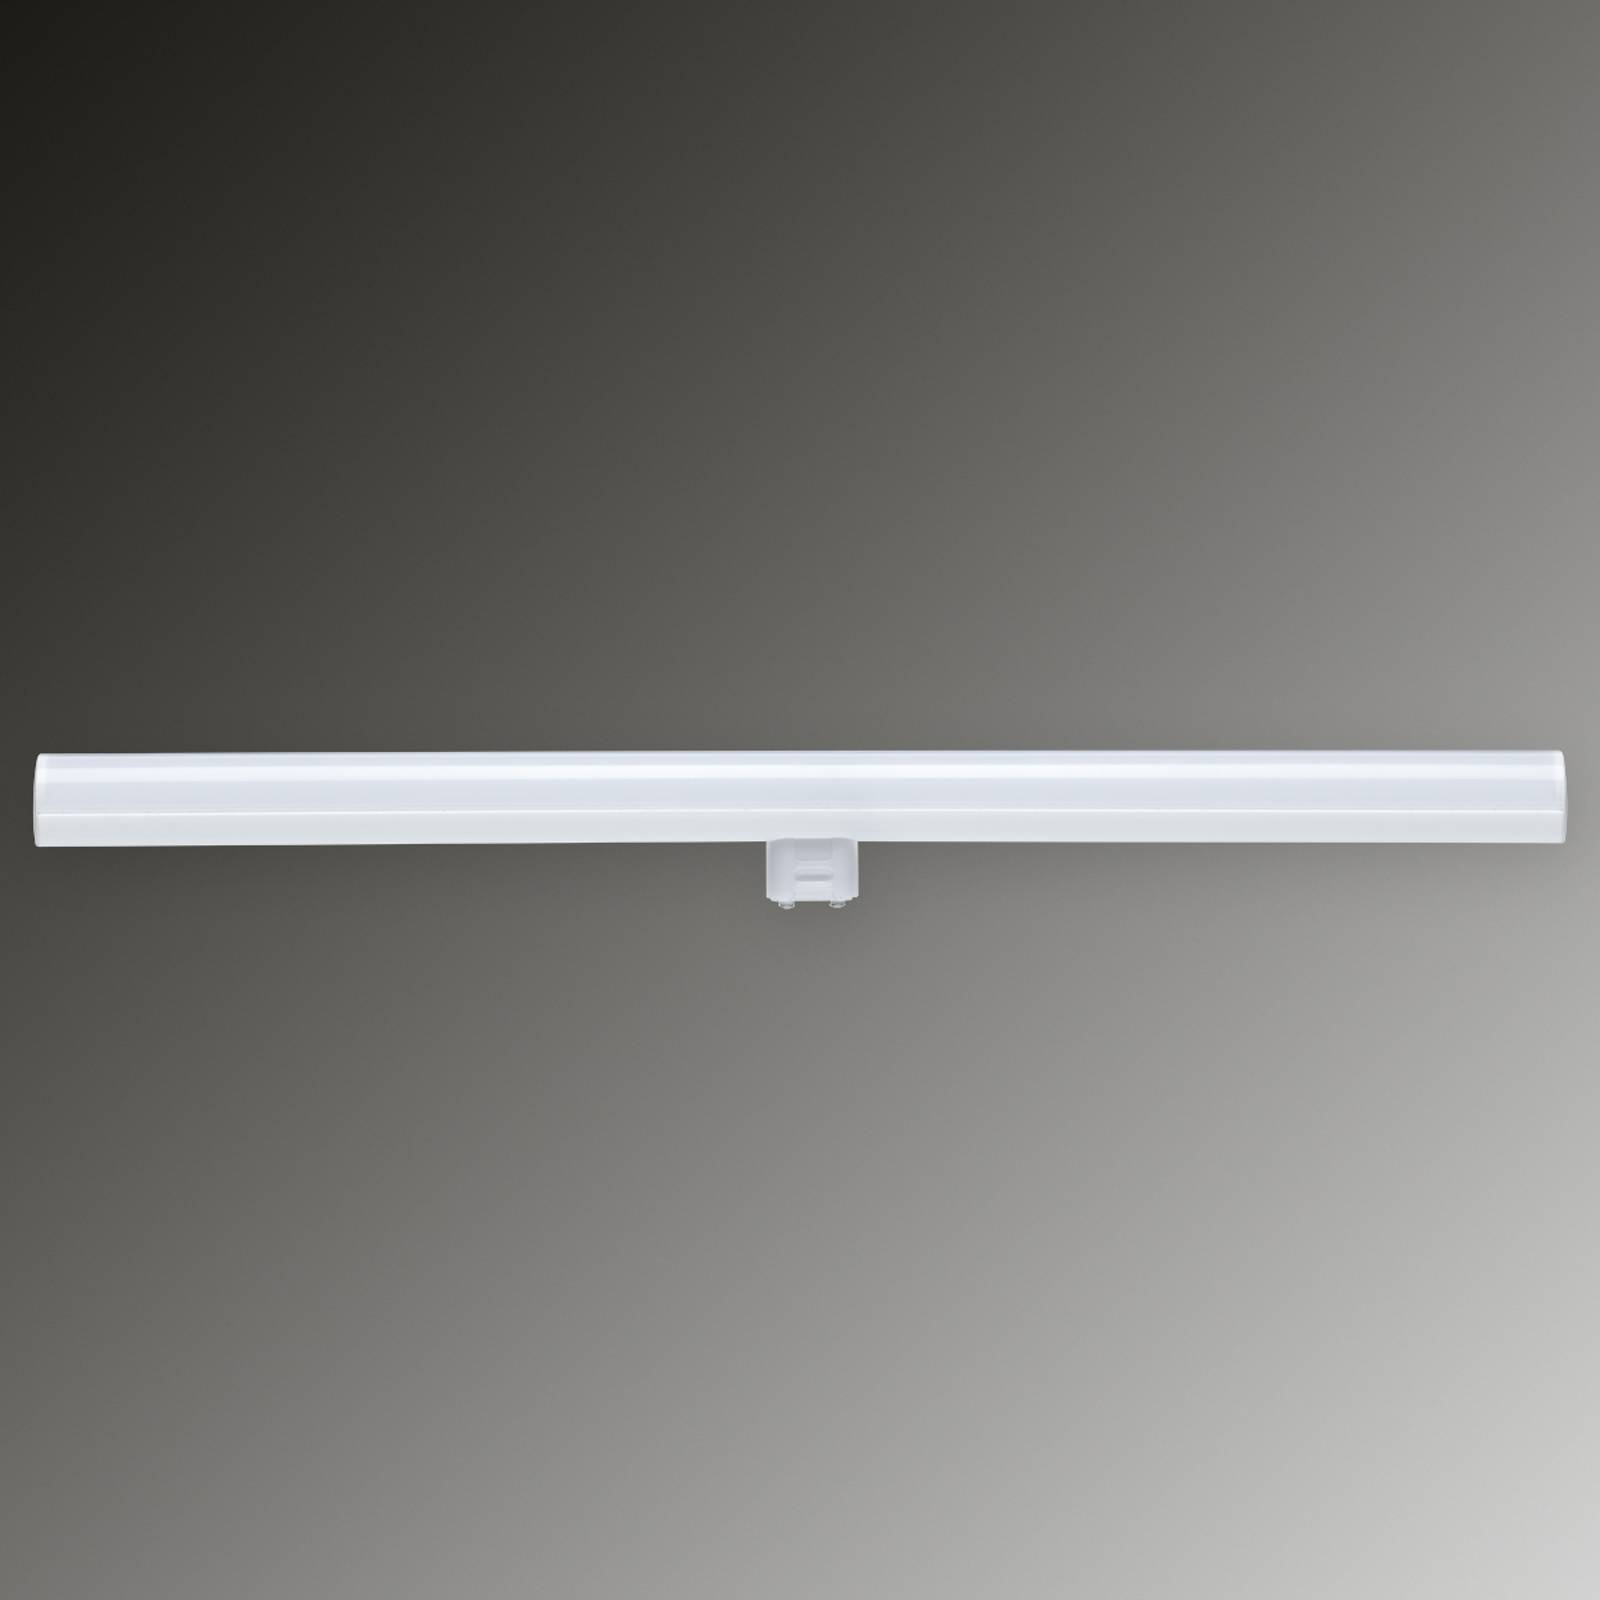 Paulmann LED-Linienlampe S14d 6,5W 827 500mm